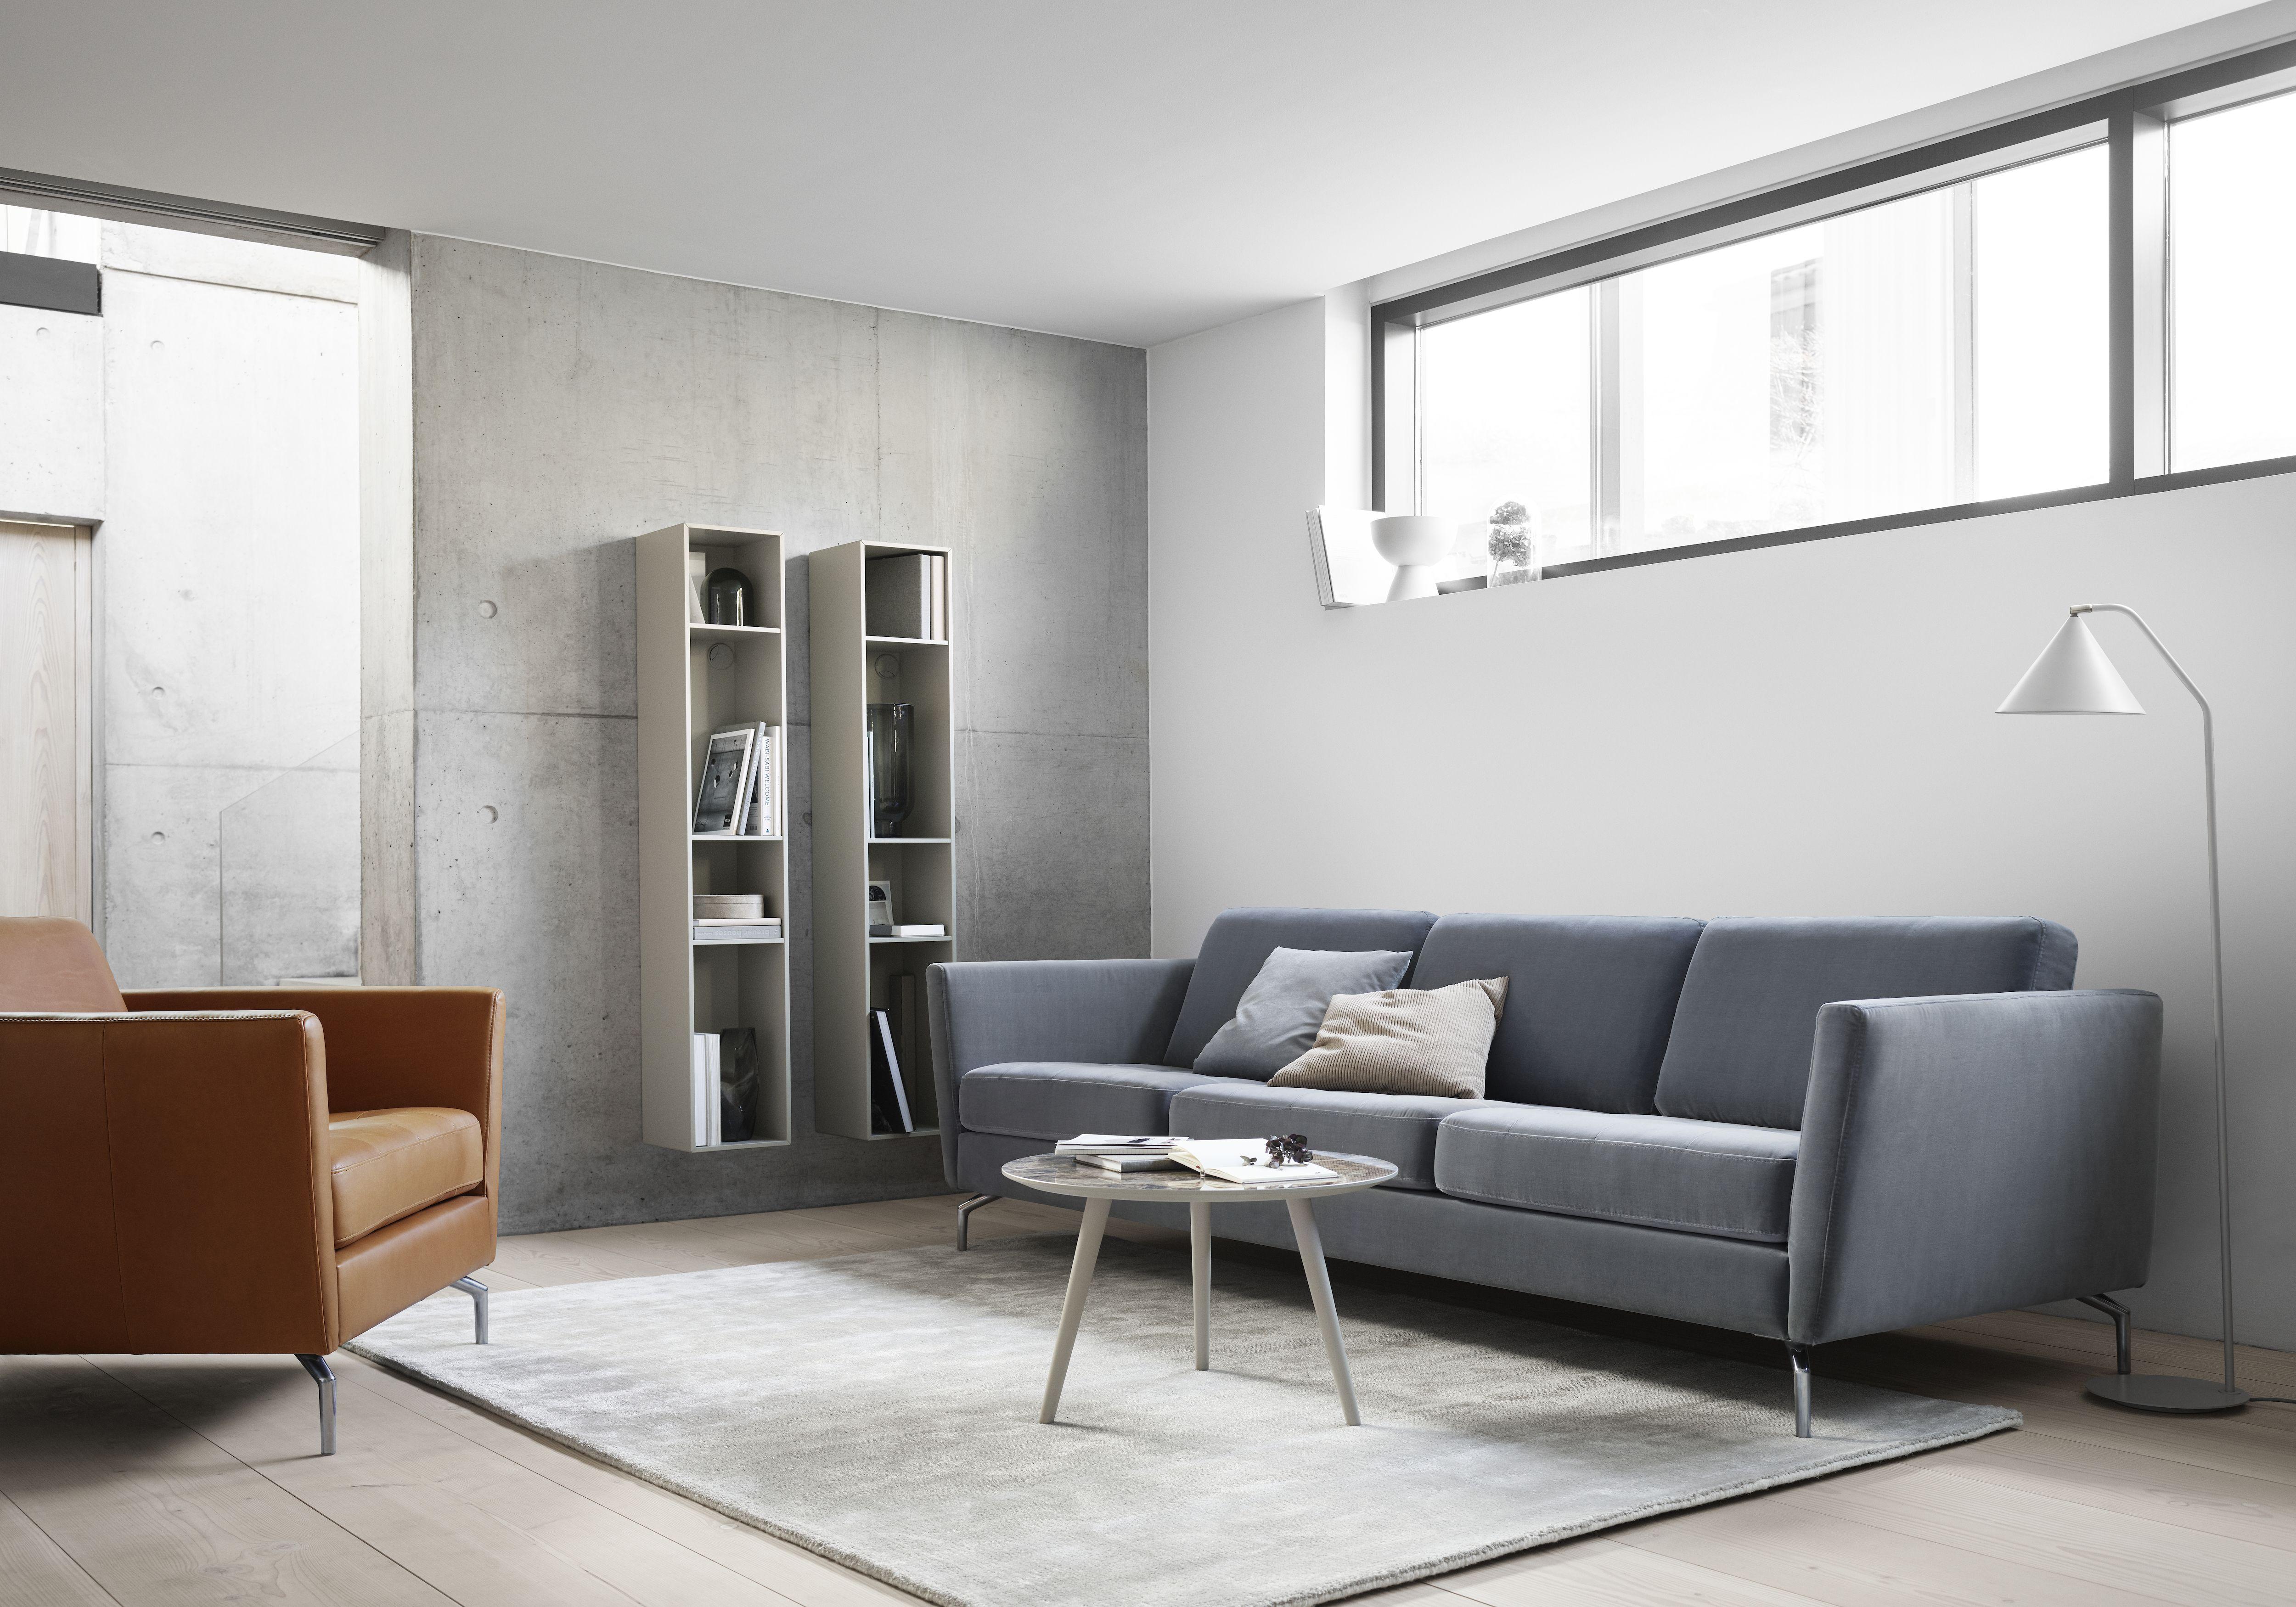 A Light And Calming Aesthetic Sofas For Small Spaces Living Room Designs Scandinavian Sofa Design